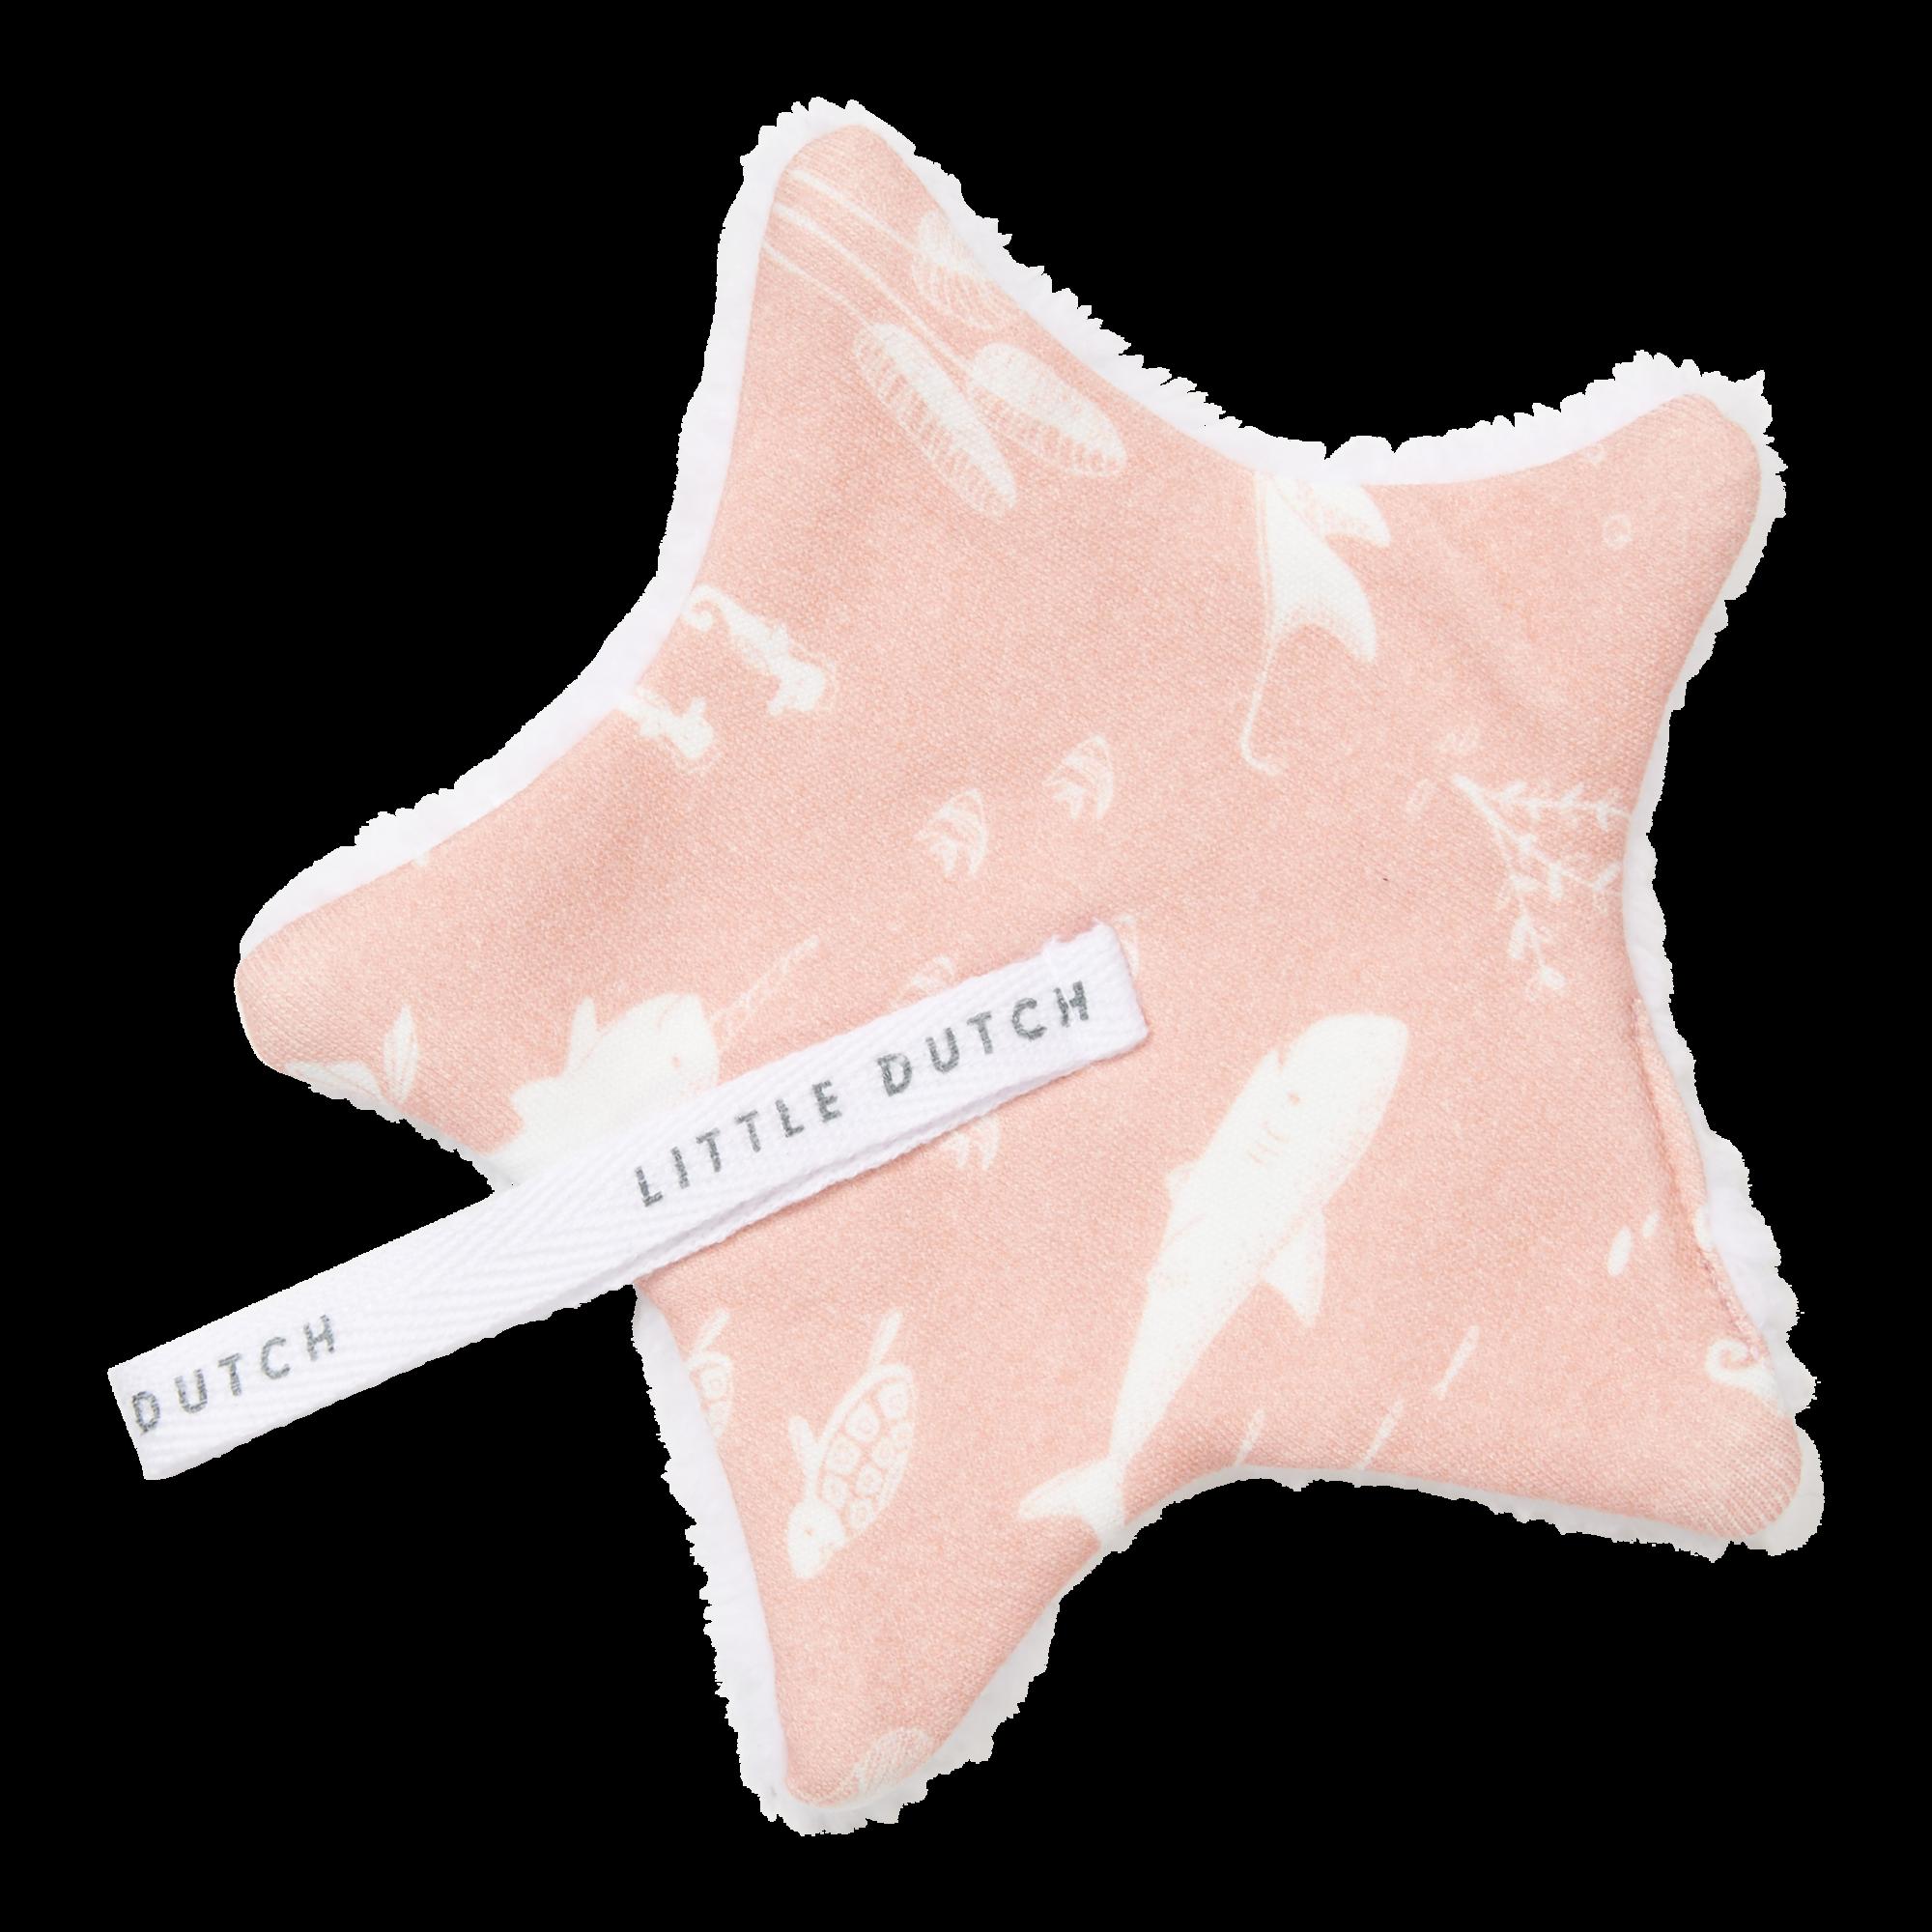 Little Dutch Speendoekje Ocean Pink